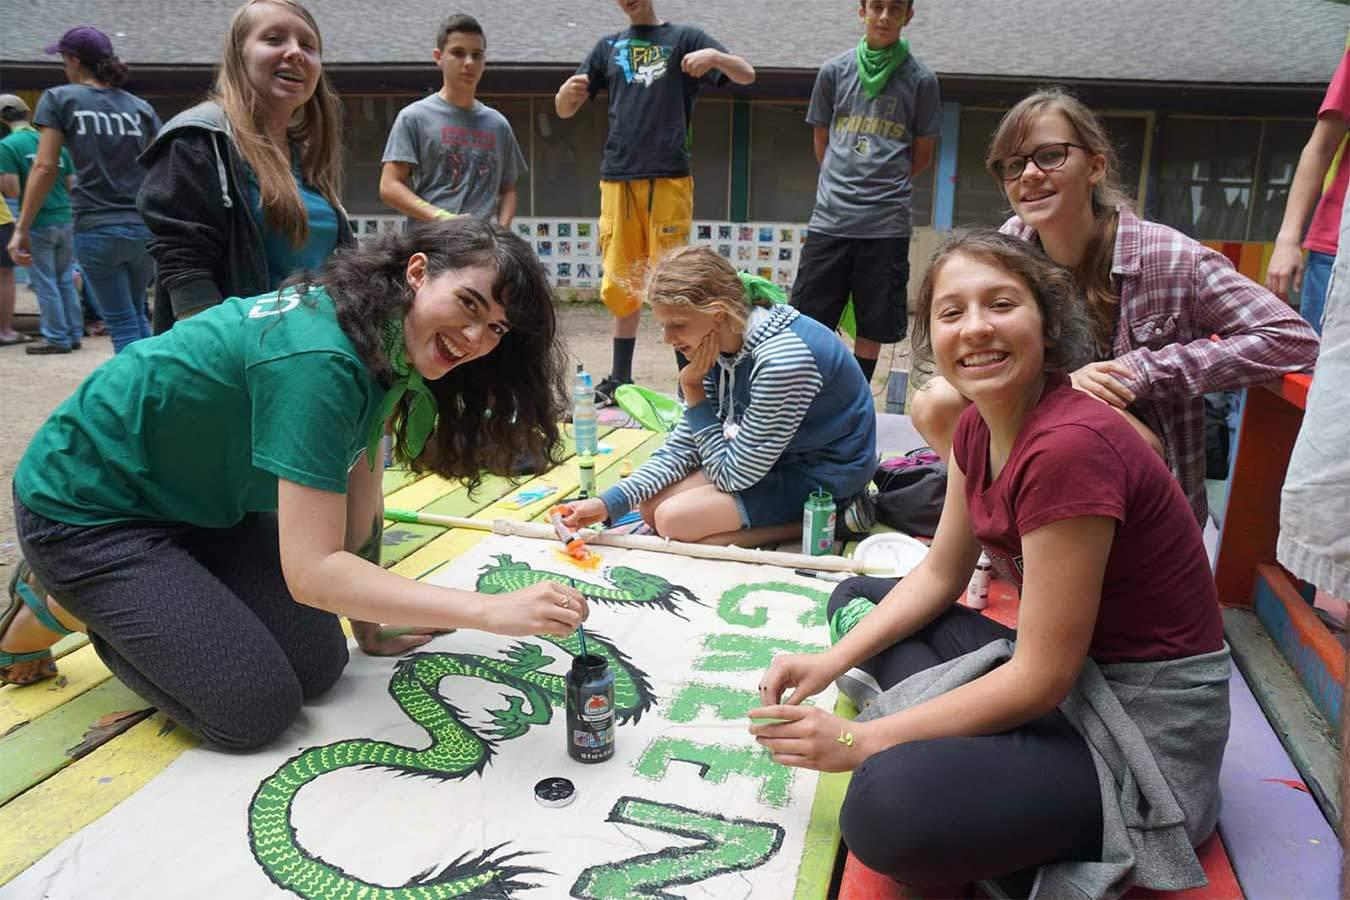 12-21 youth at Camp Tzadi creating team posters